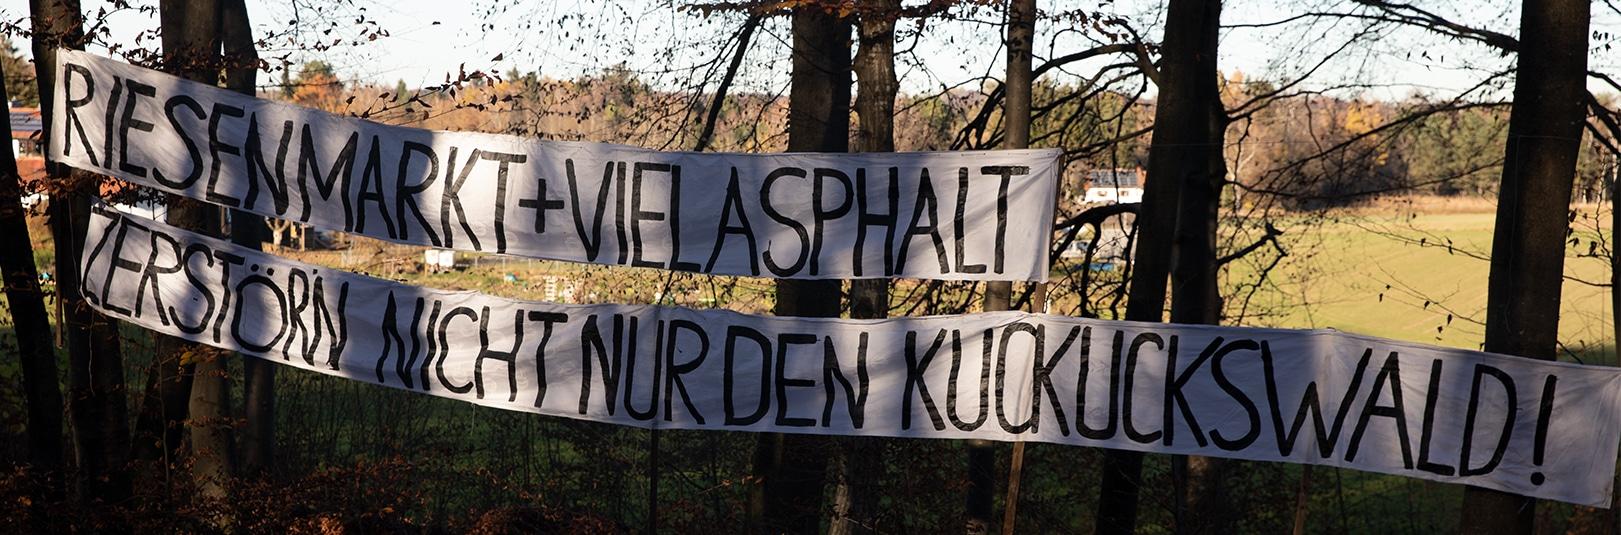 Transparent Kuckuckswald